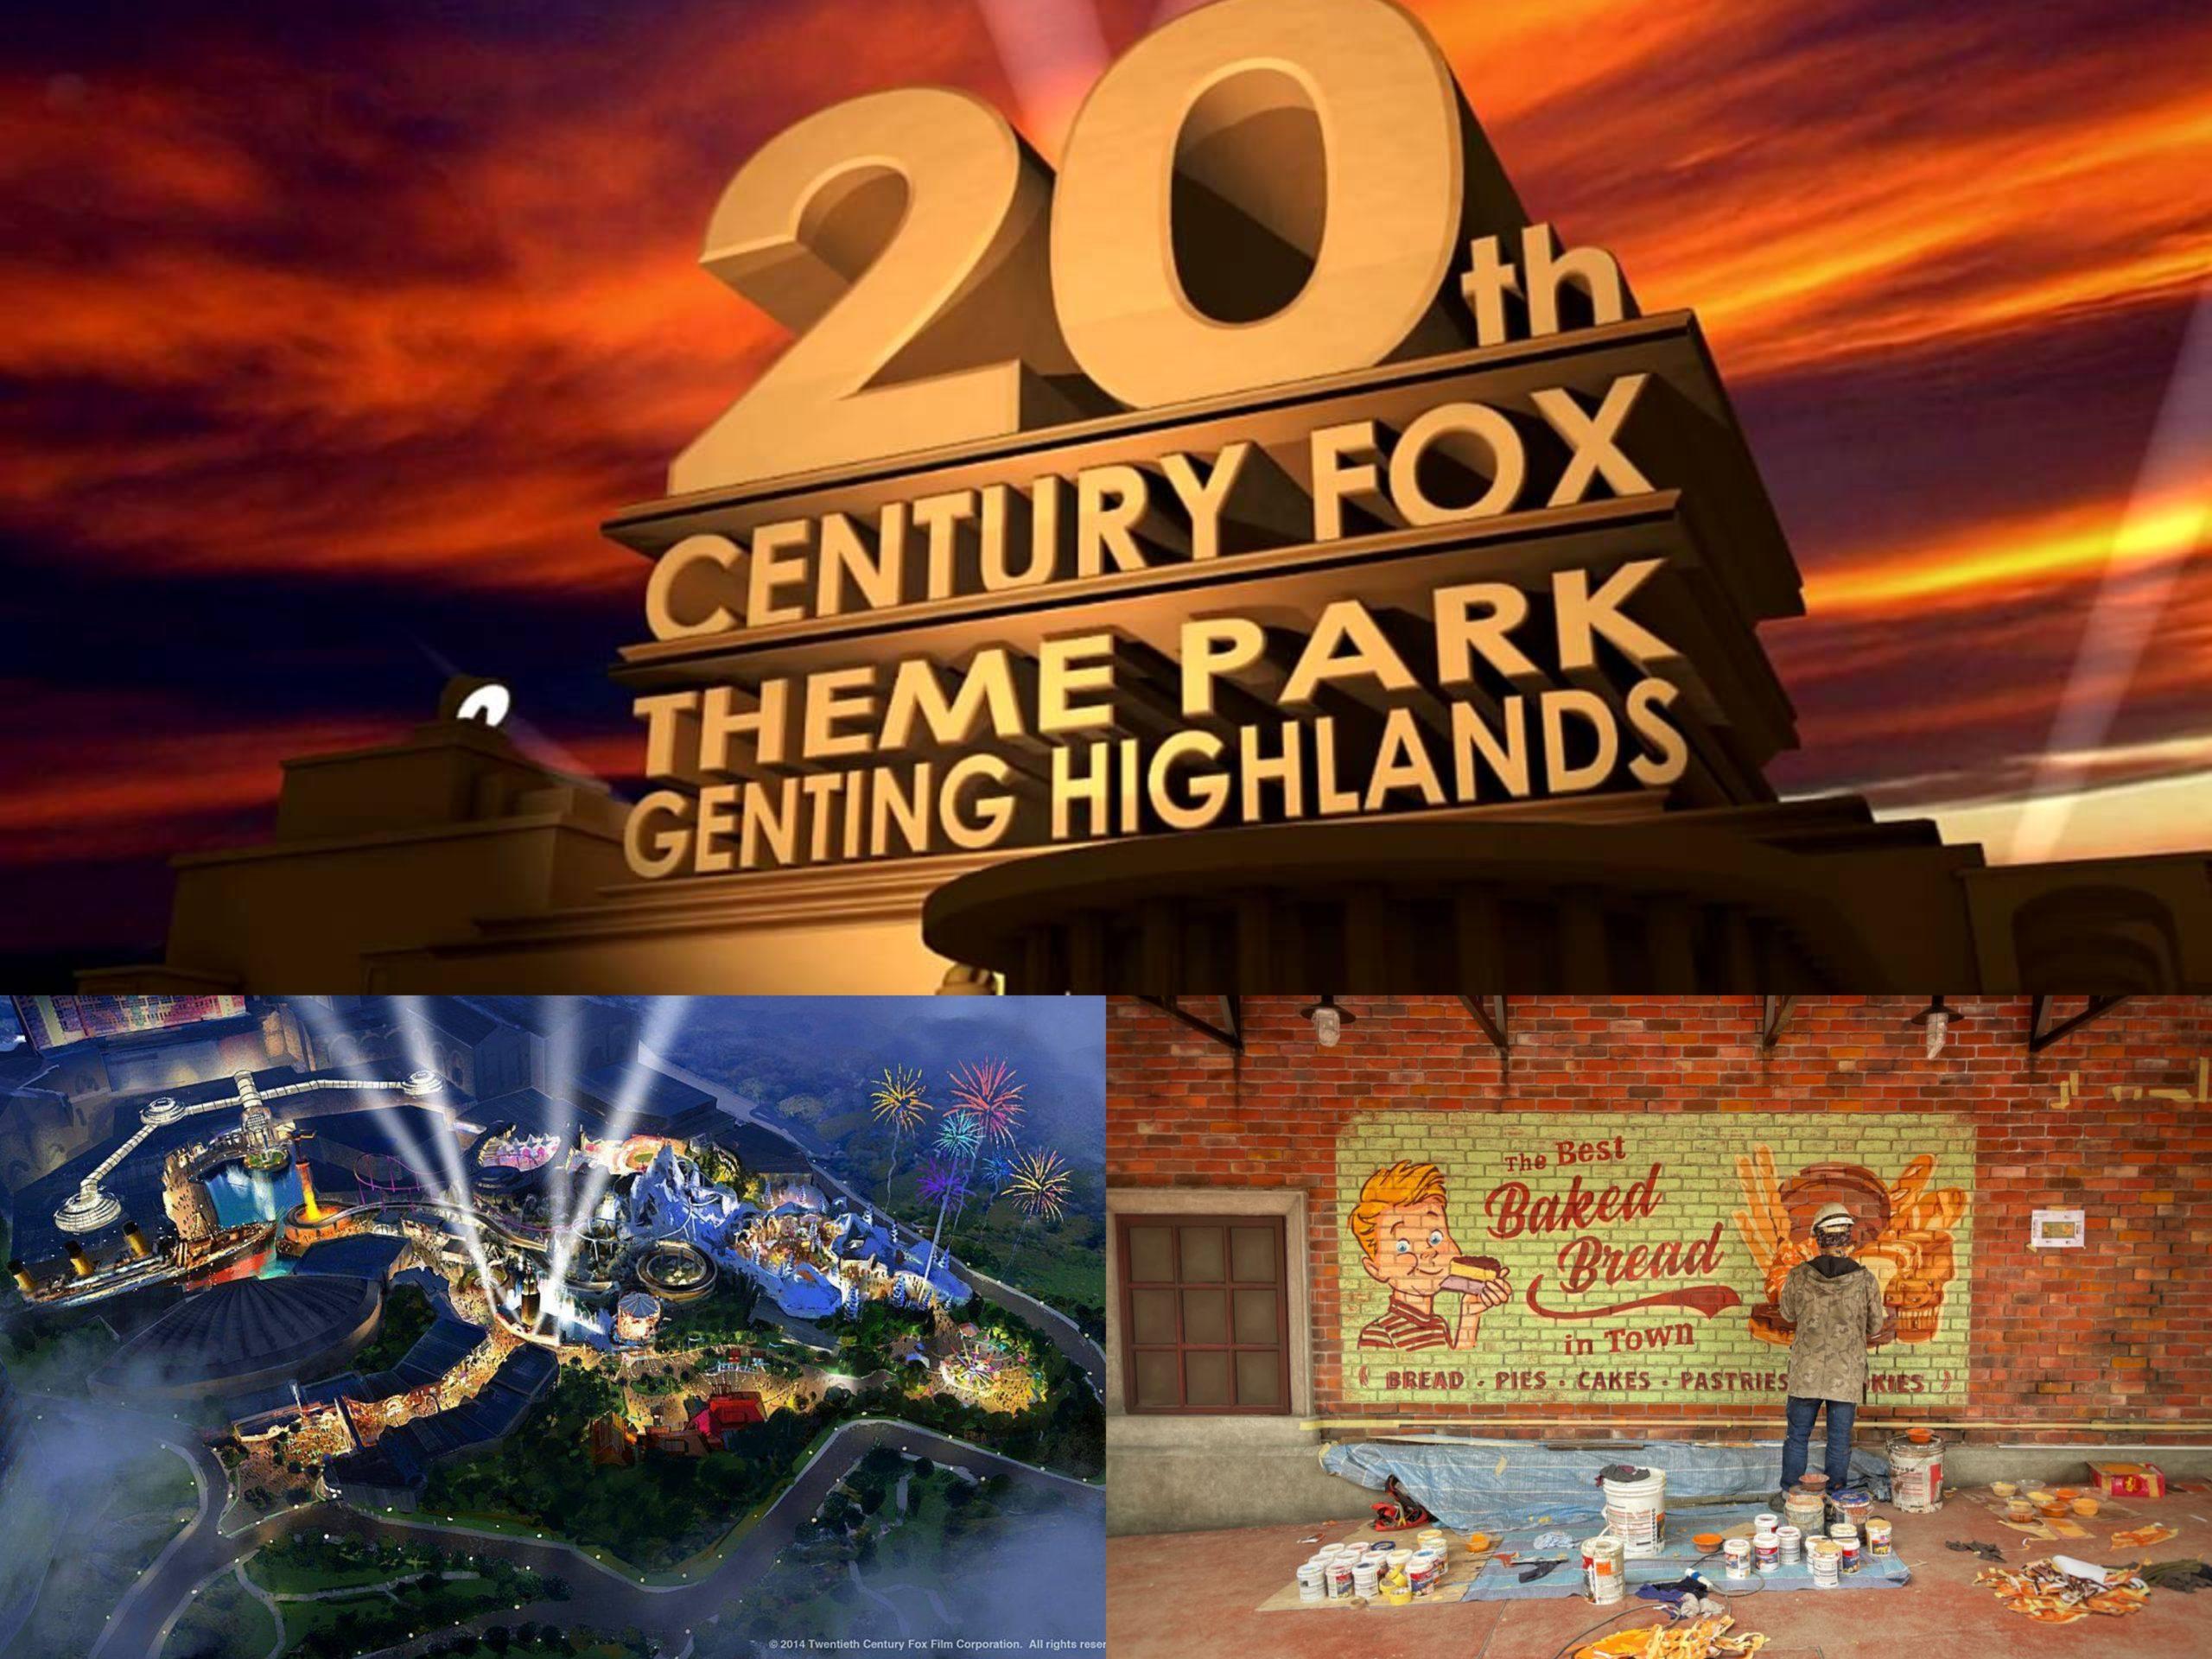 Apa Cerita Genting Highland x 20th Century Fox?